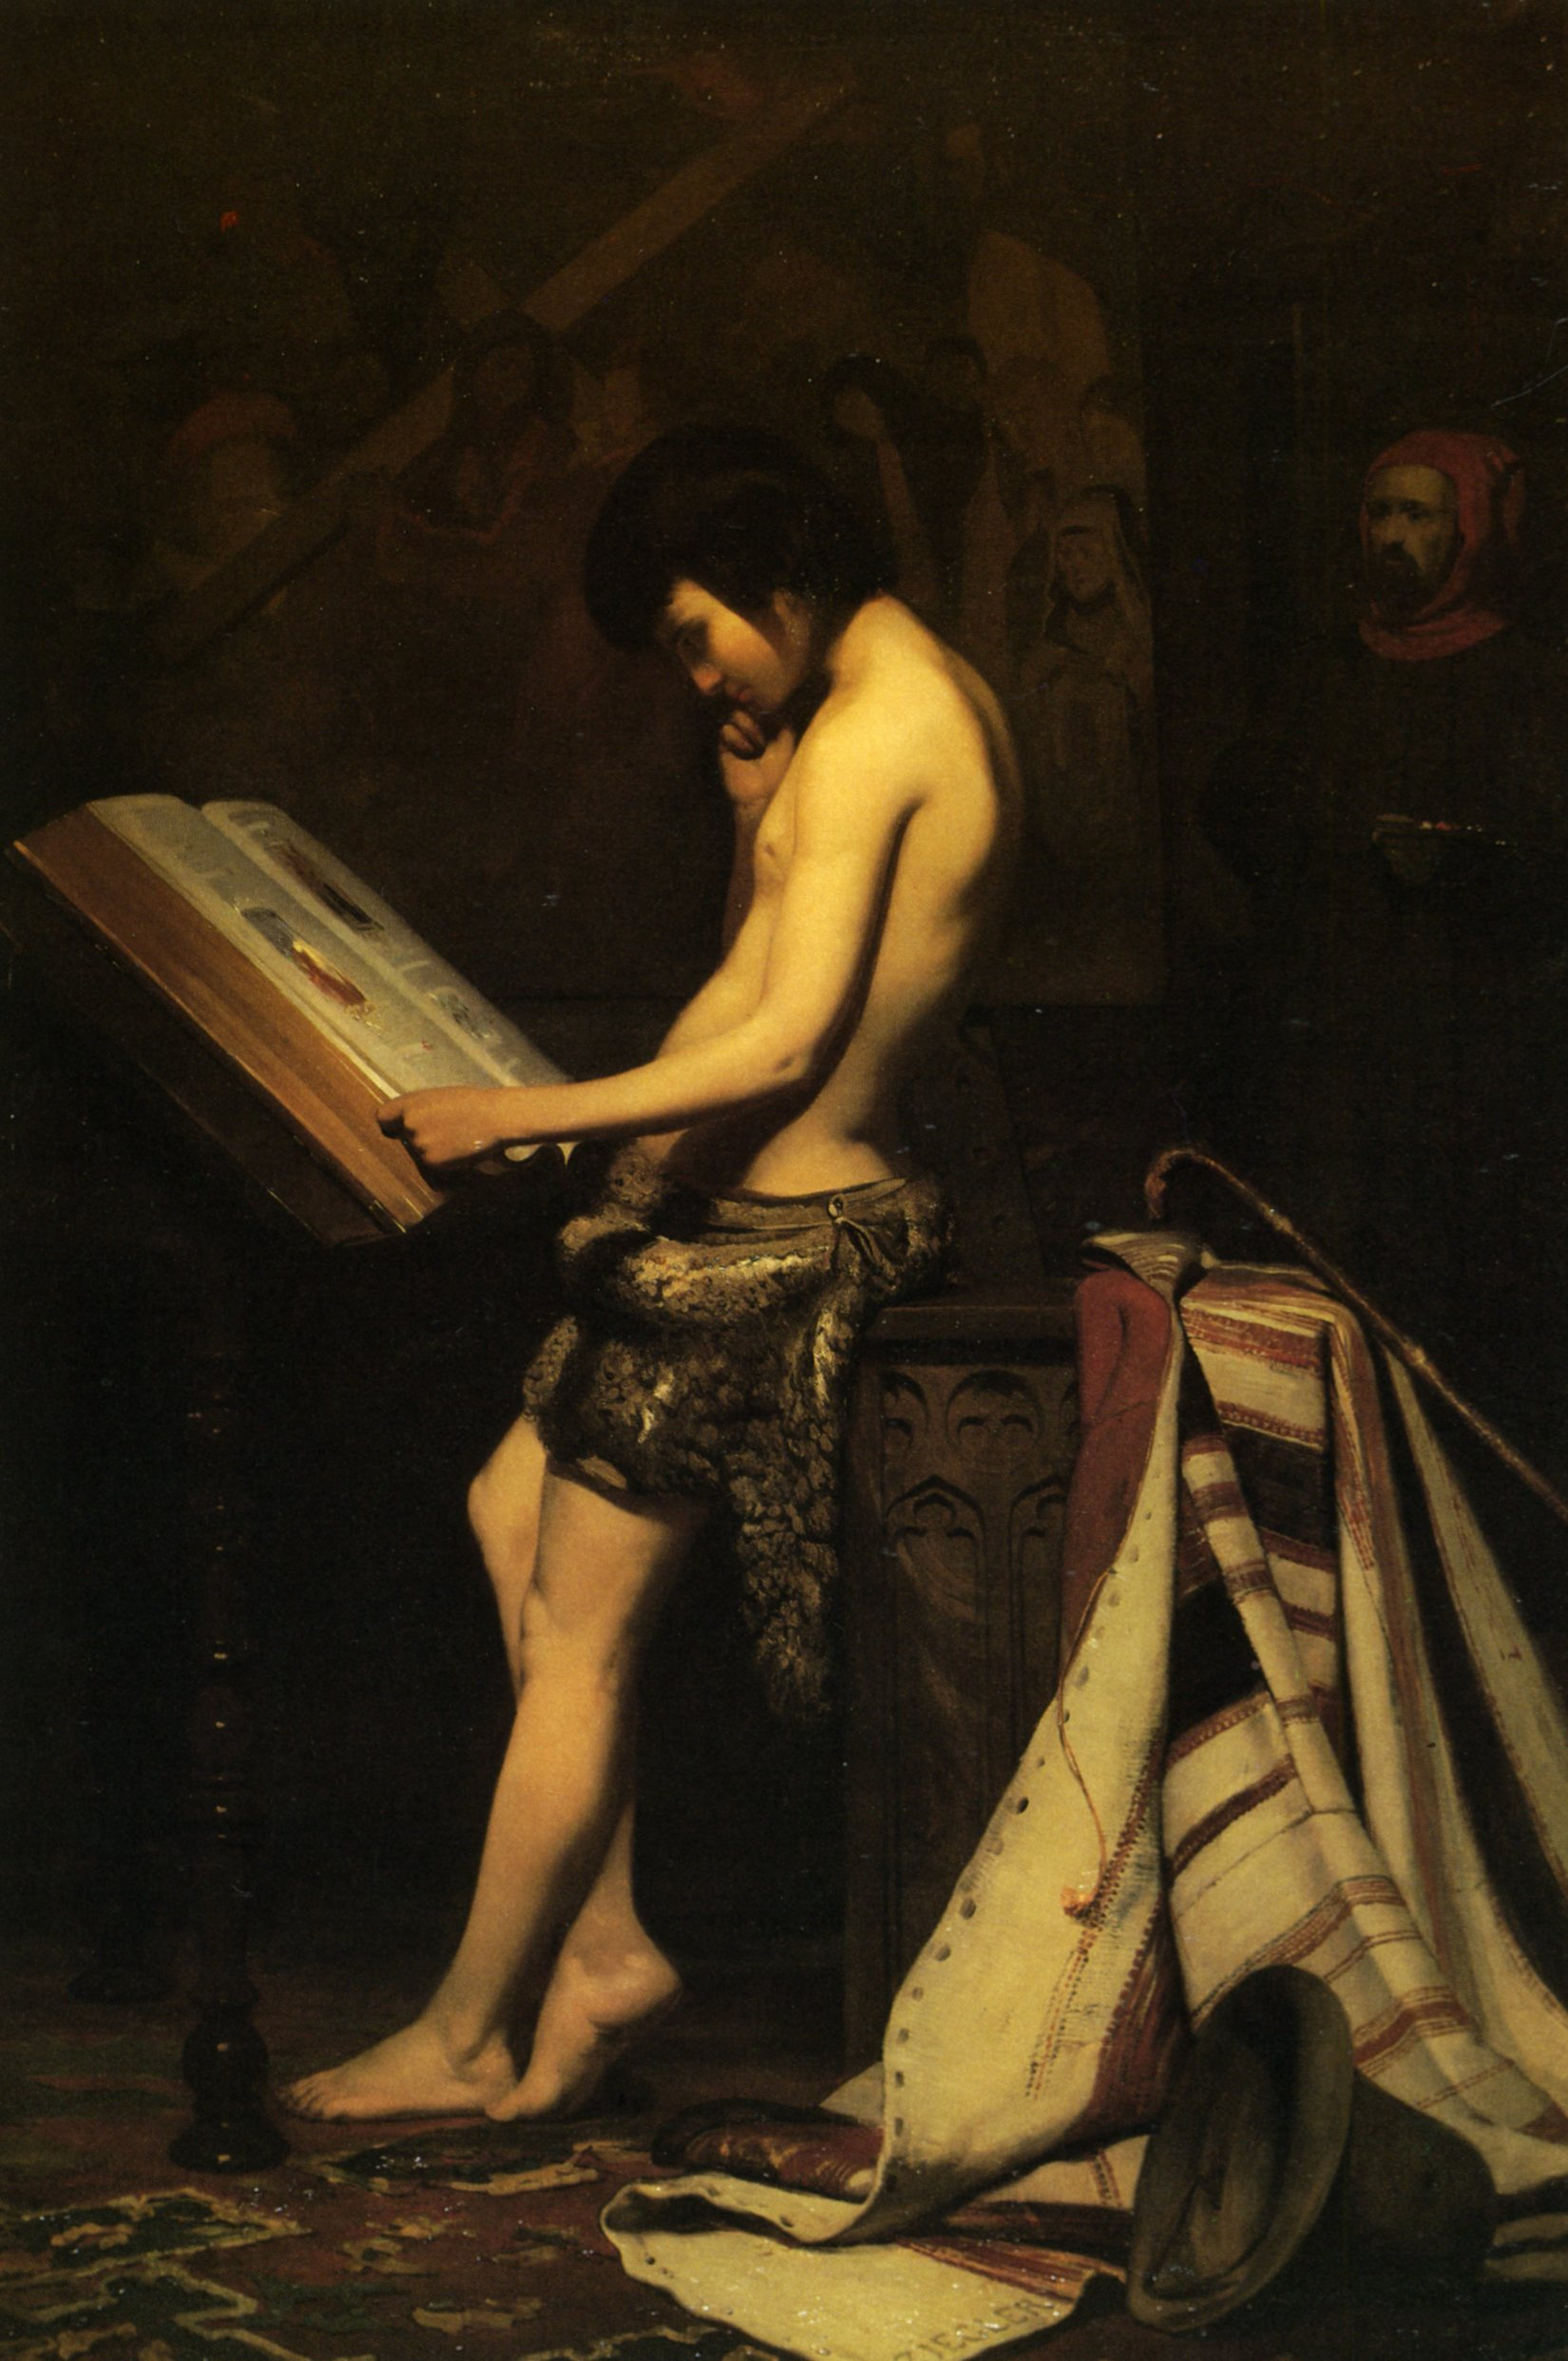 1847  ziegler jules giotto dans l'atelier de cimabue